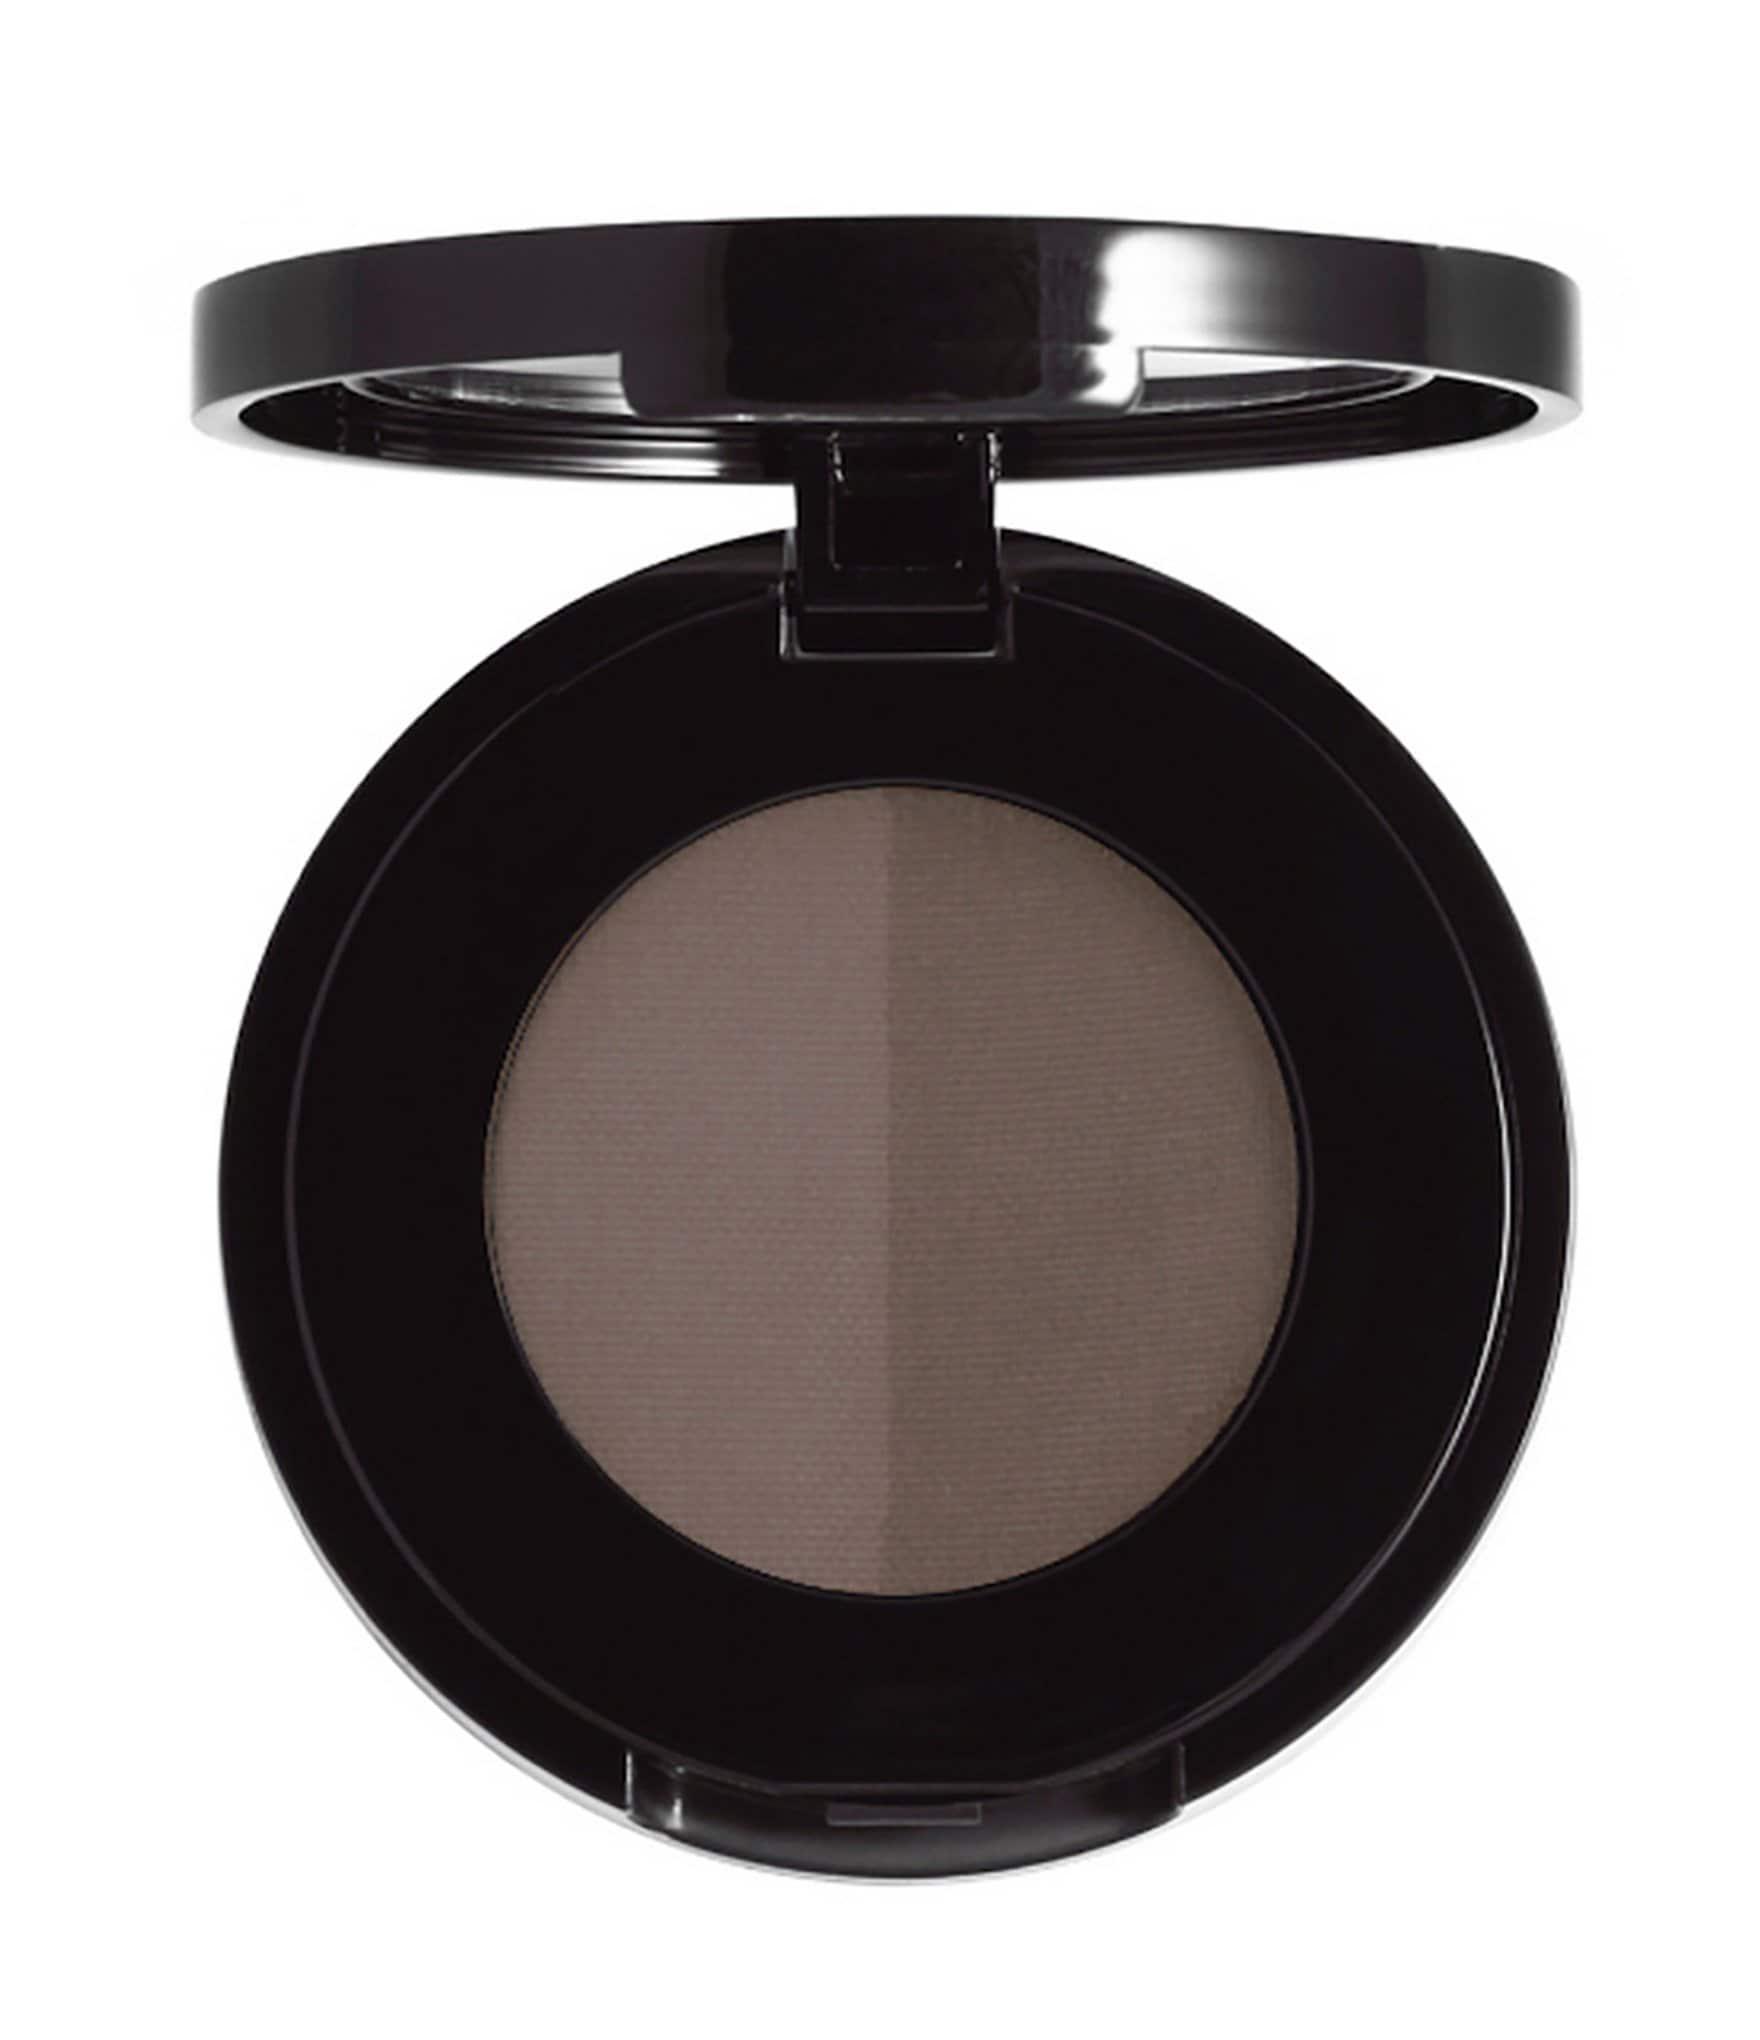 Anastasia Beverly Hills Cosmetics Skincare Beauty Dillards Kuas Mascara Shadow